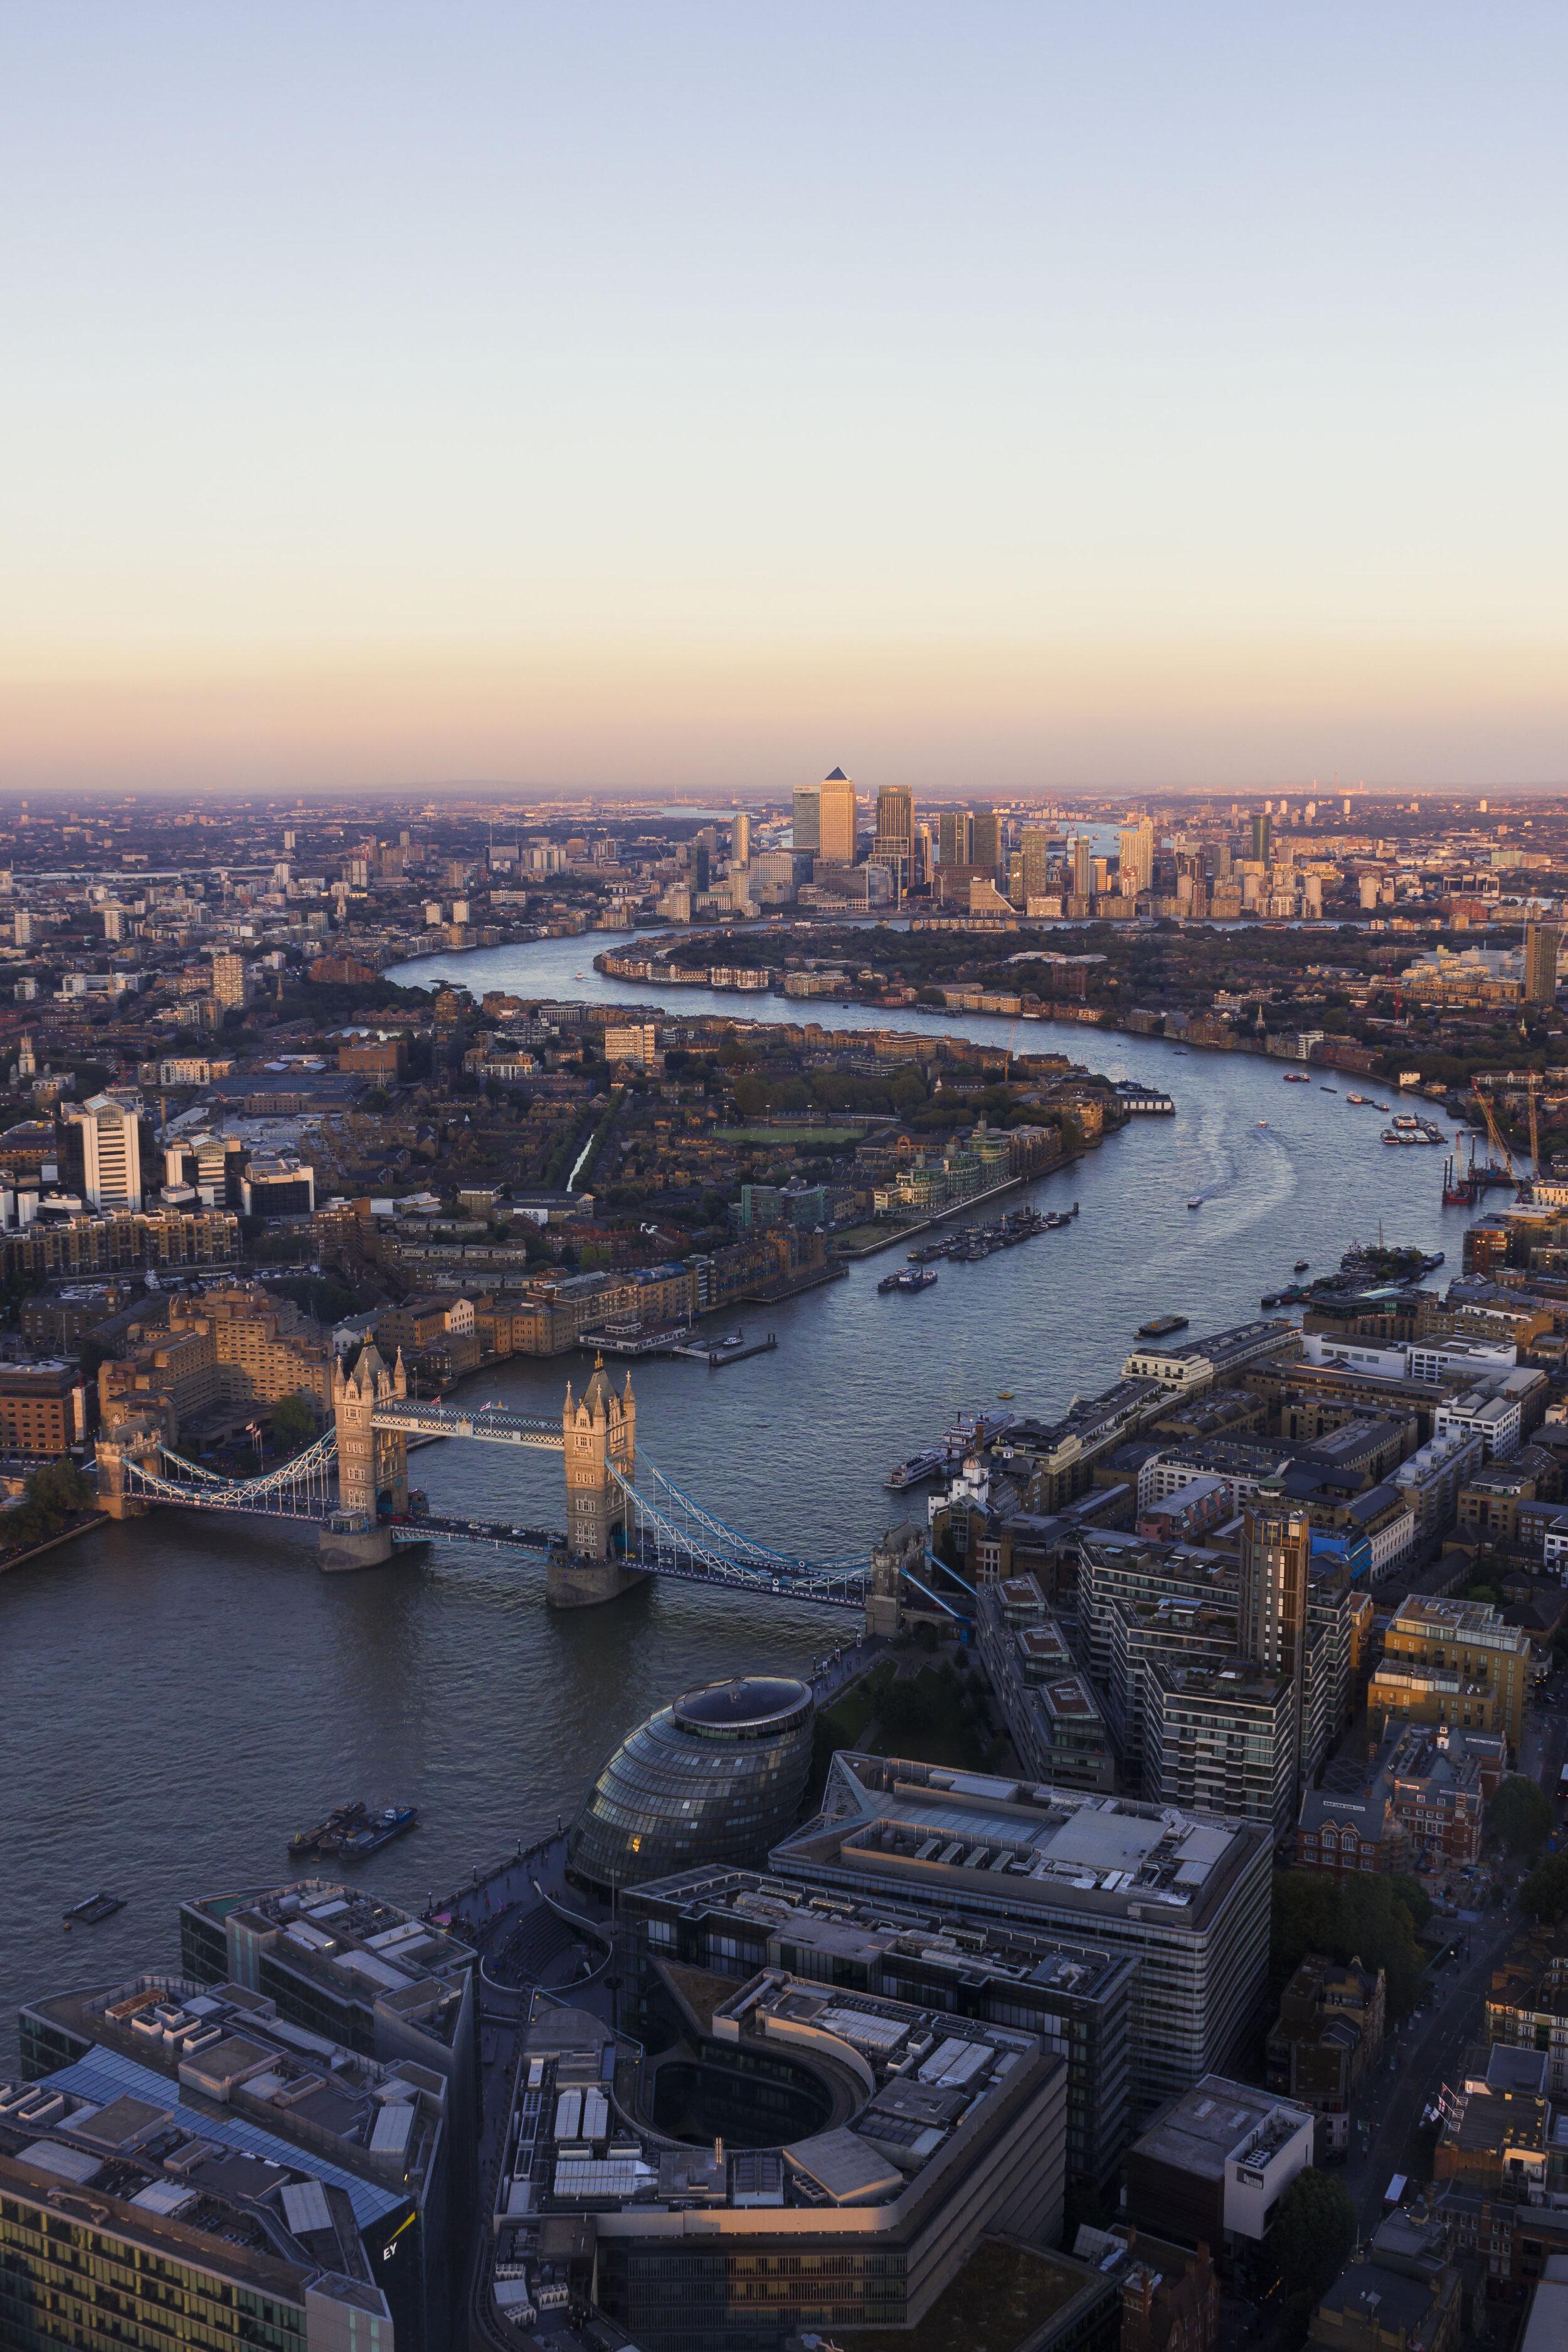 Tower_Bridge_at_Sunset_4.jpg